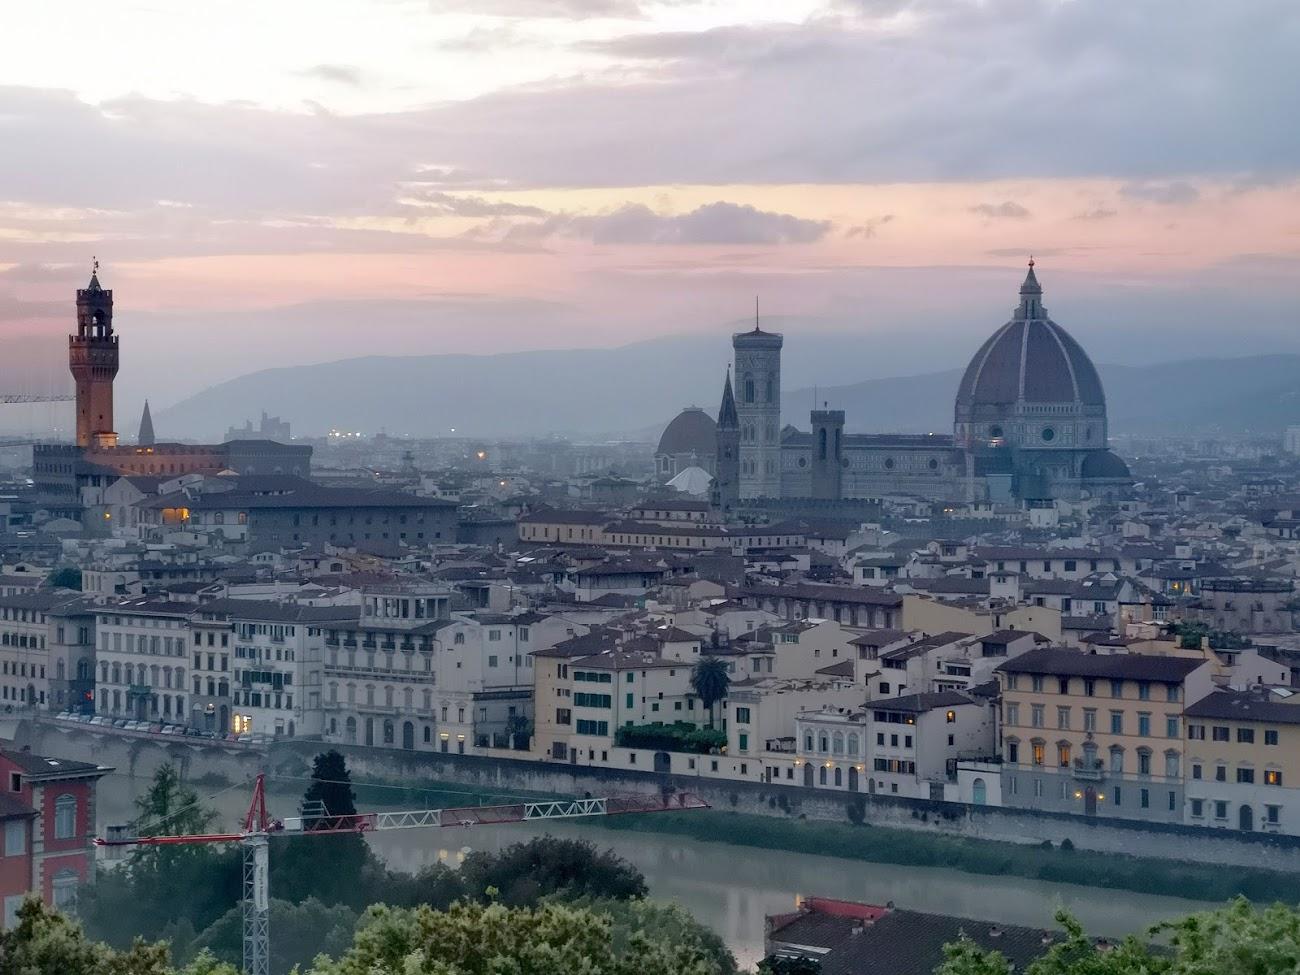 Florencia - amanecer - torre - palacio - cúpula - rio